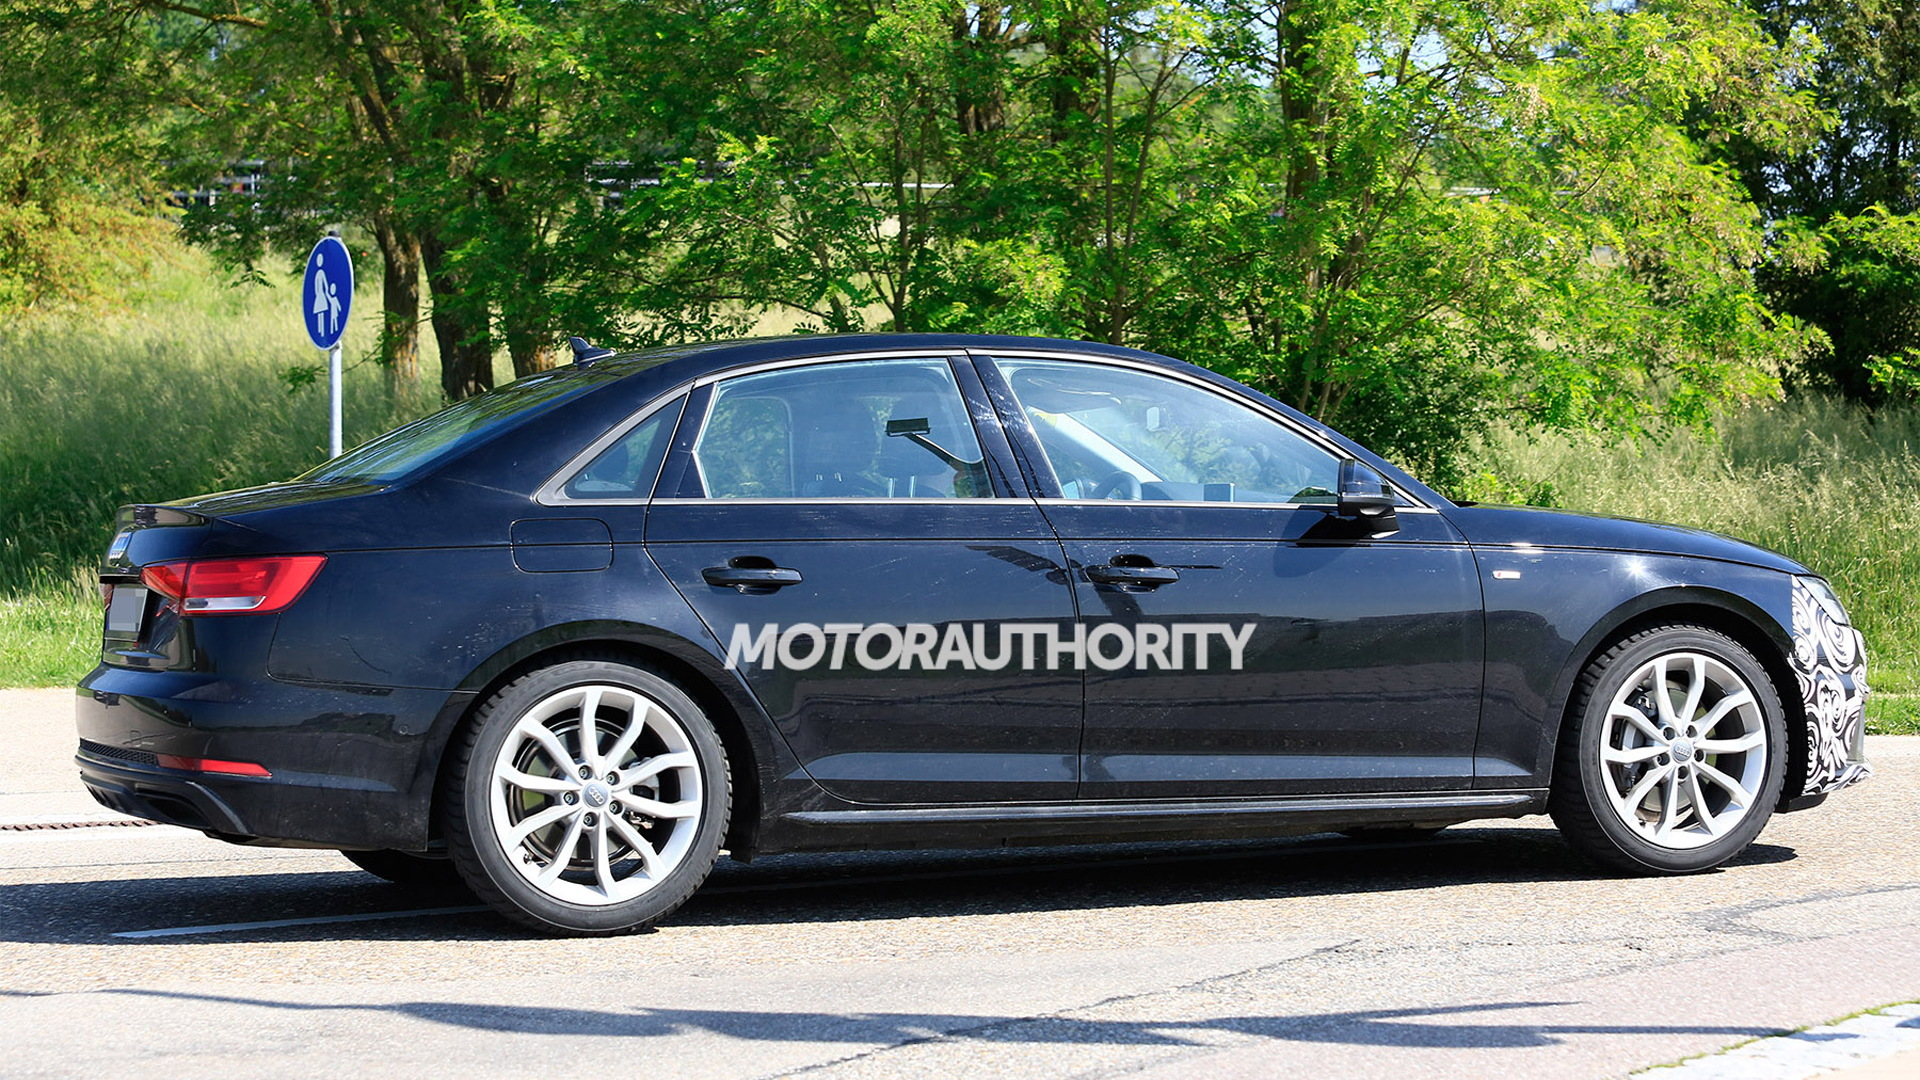 2020 Audi A4 facelift spy shots - Image via S. Baldauf/SB-Medien